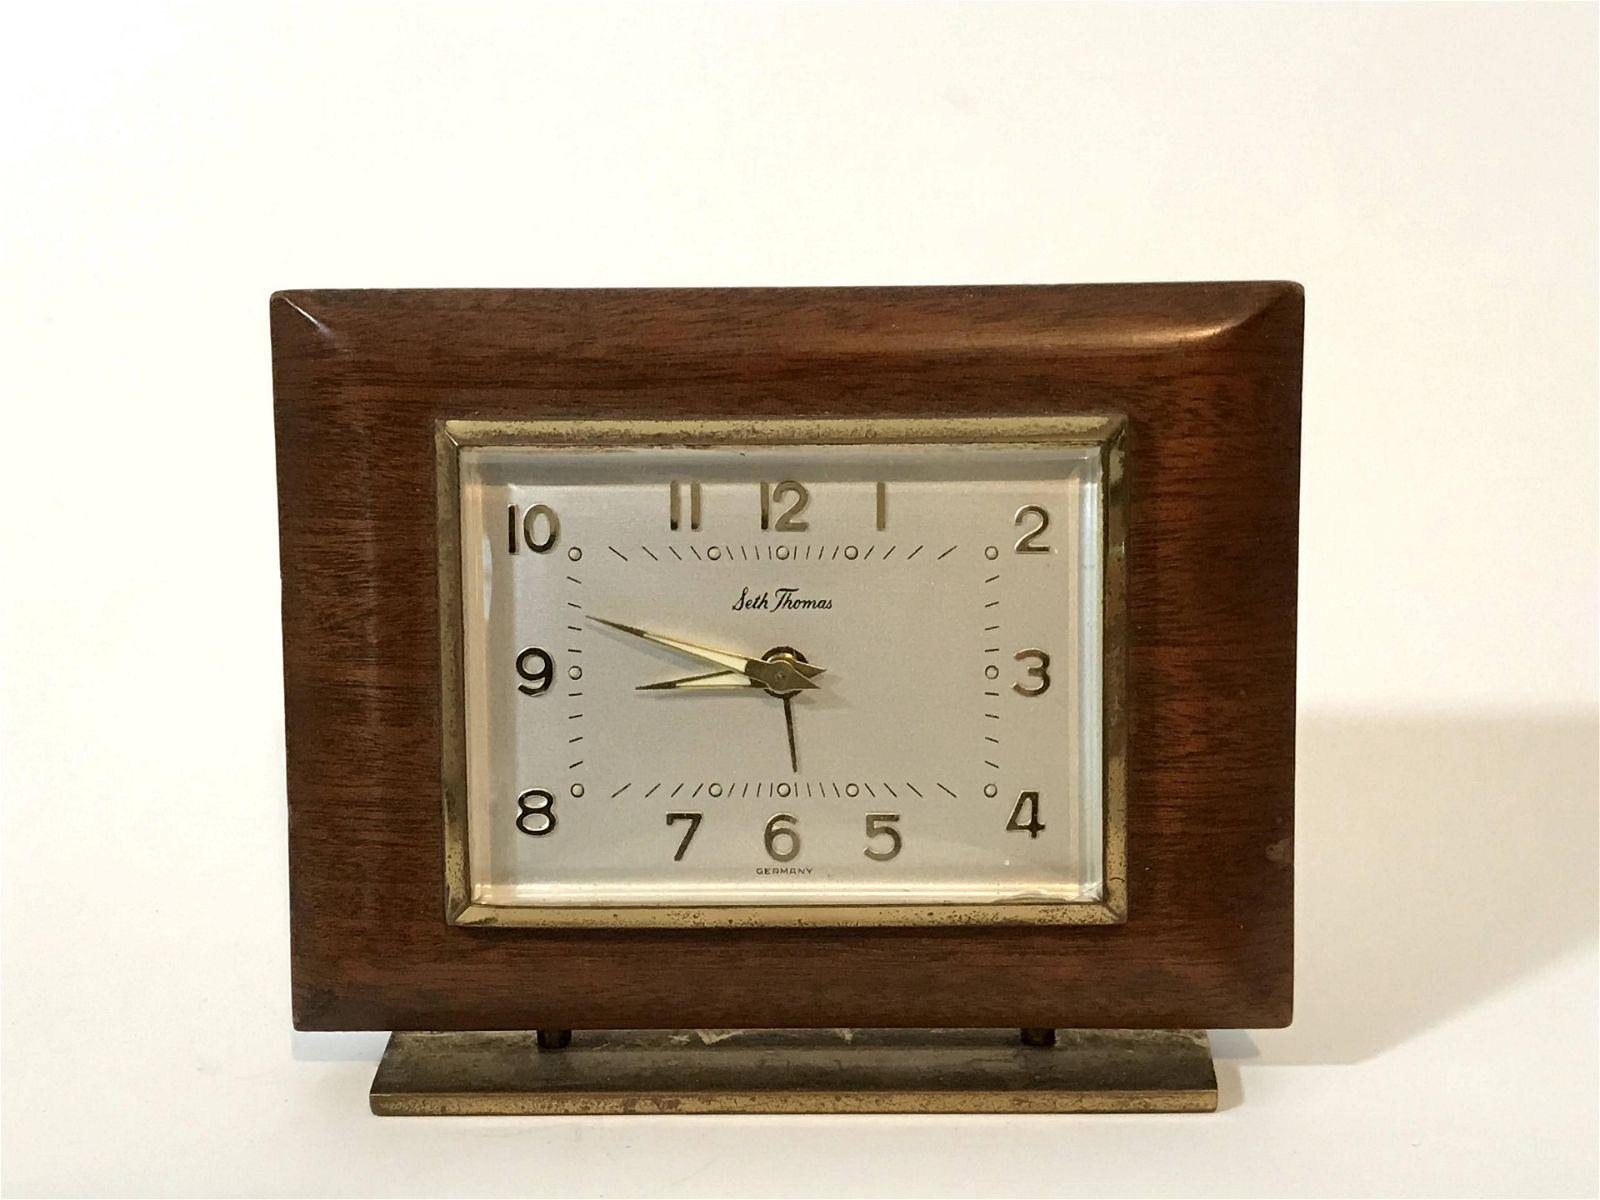 Vintage Seth Thomas Small Alarm Clock 1950's Brown